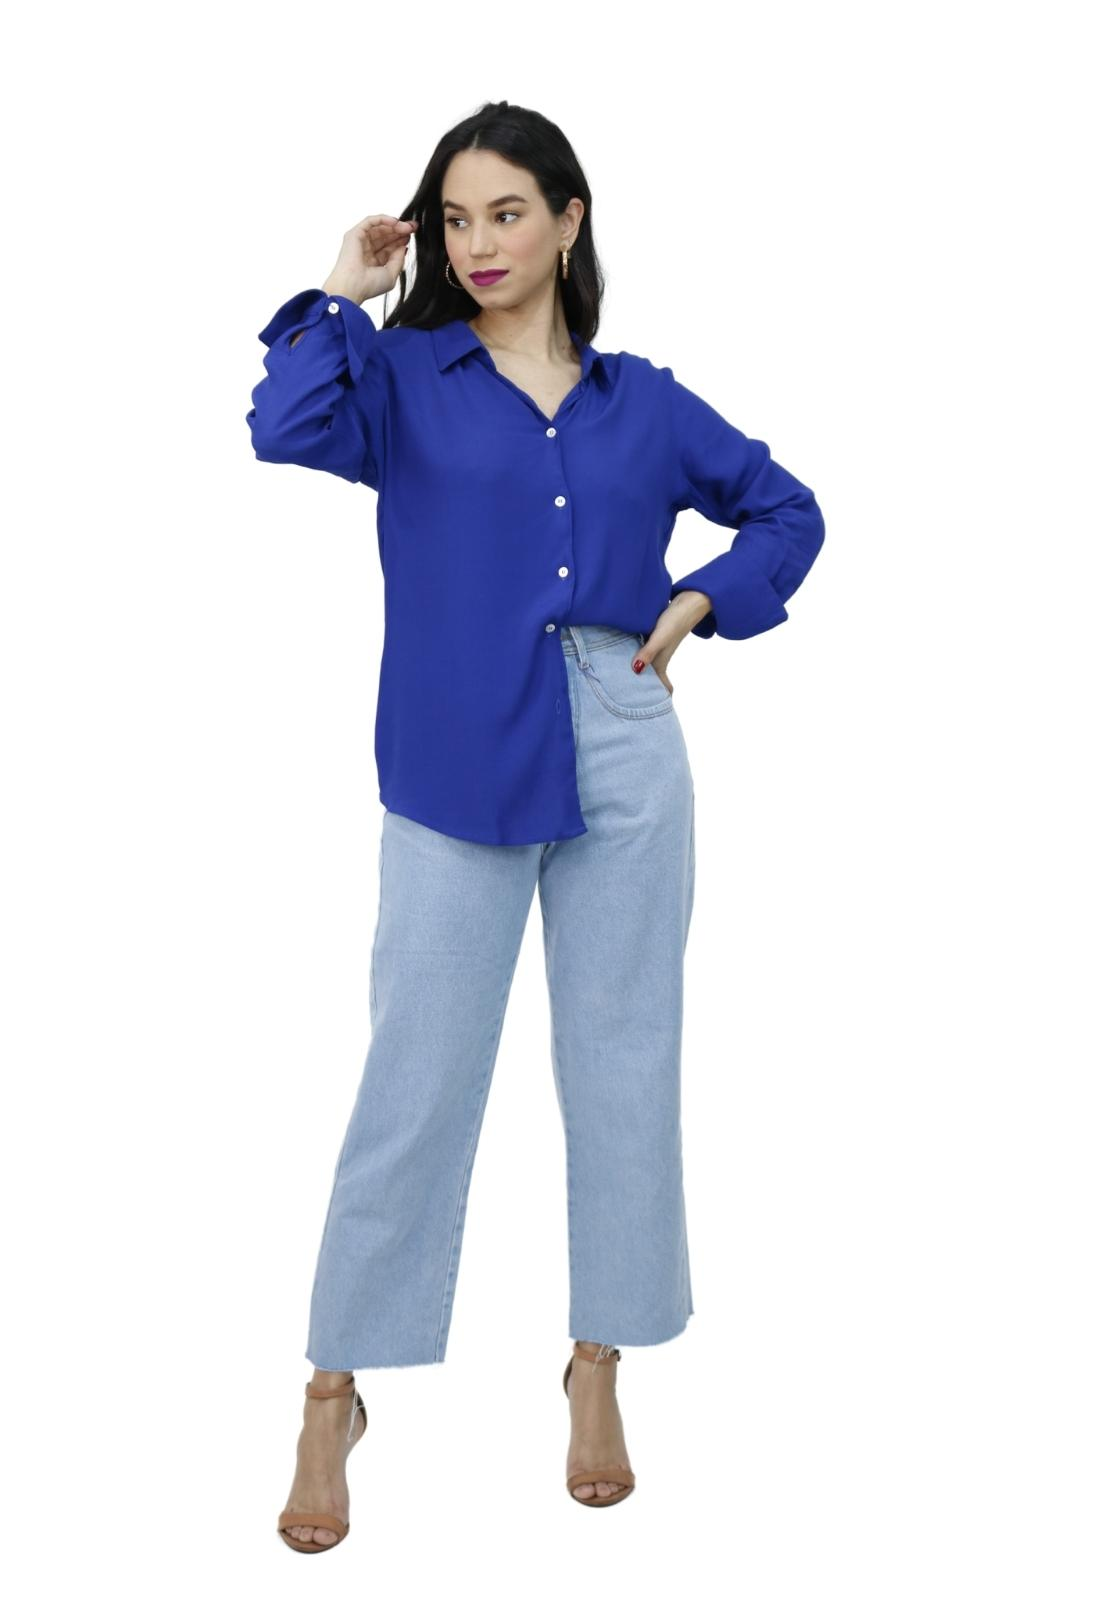 Camisa Feminina Alongada Manga Longa Crepe Botões Elegante